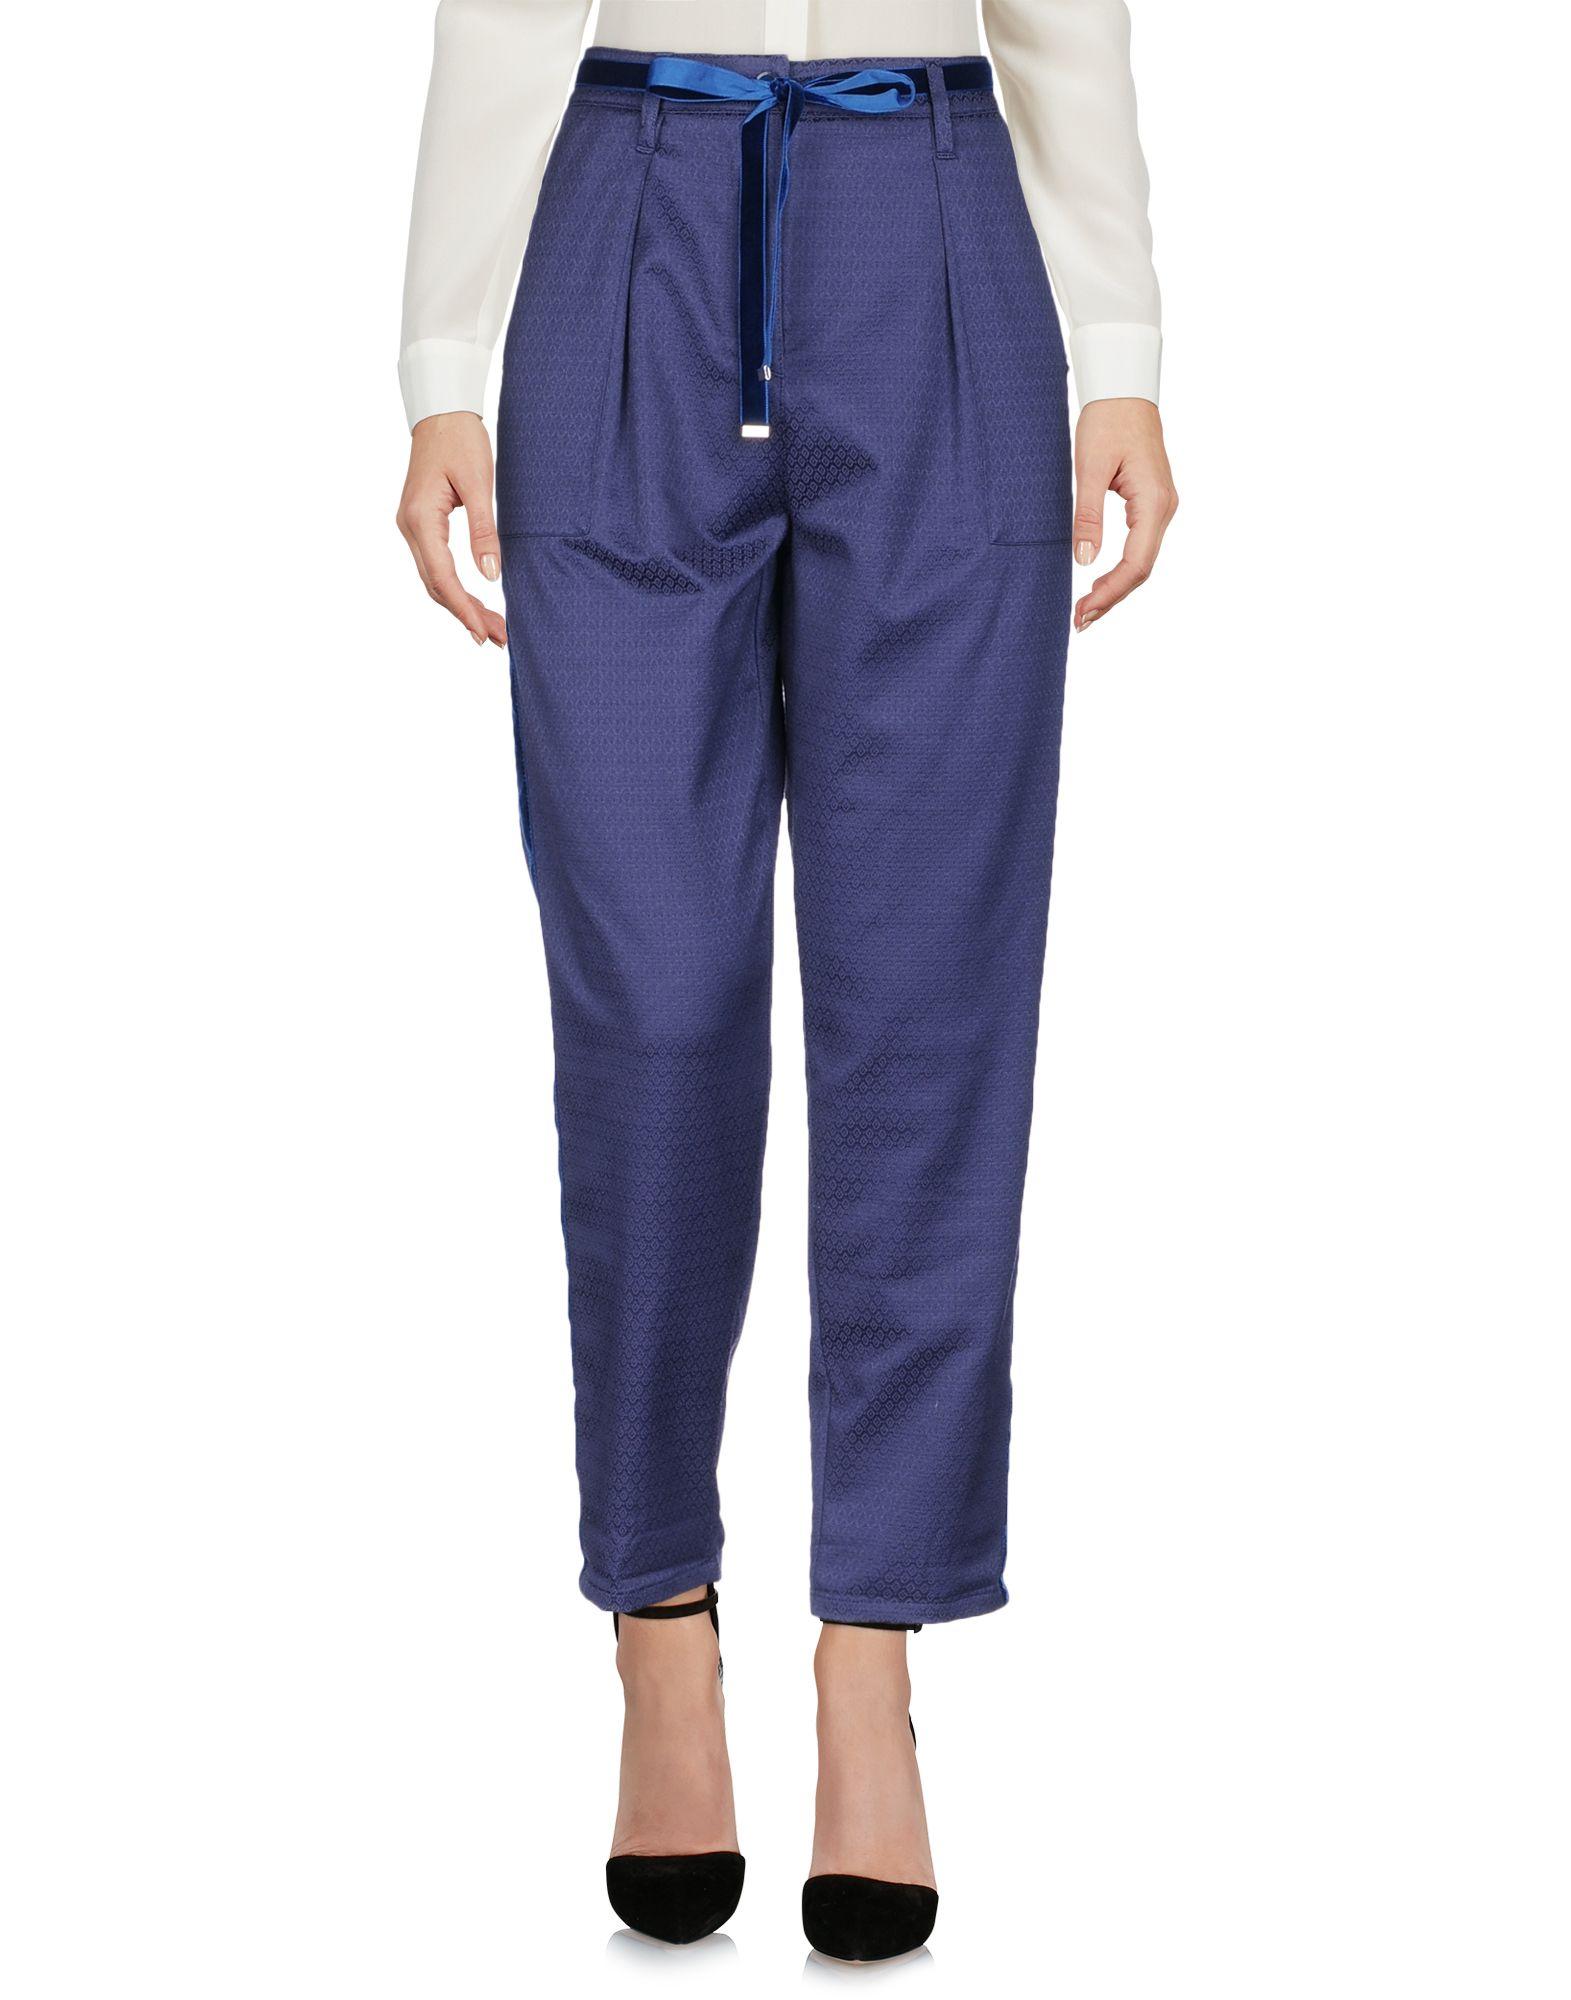 Pantalone Pantalone Patrizia Pepe donna - 13209607AV  die neuesten Modelle